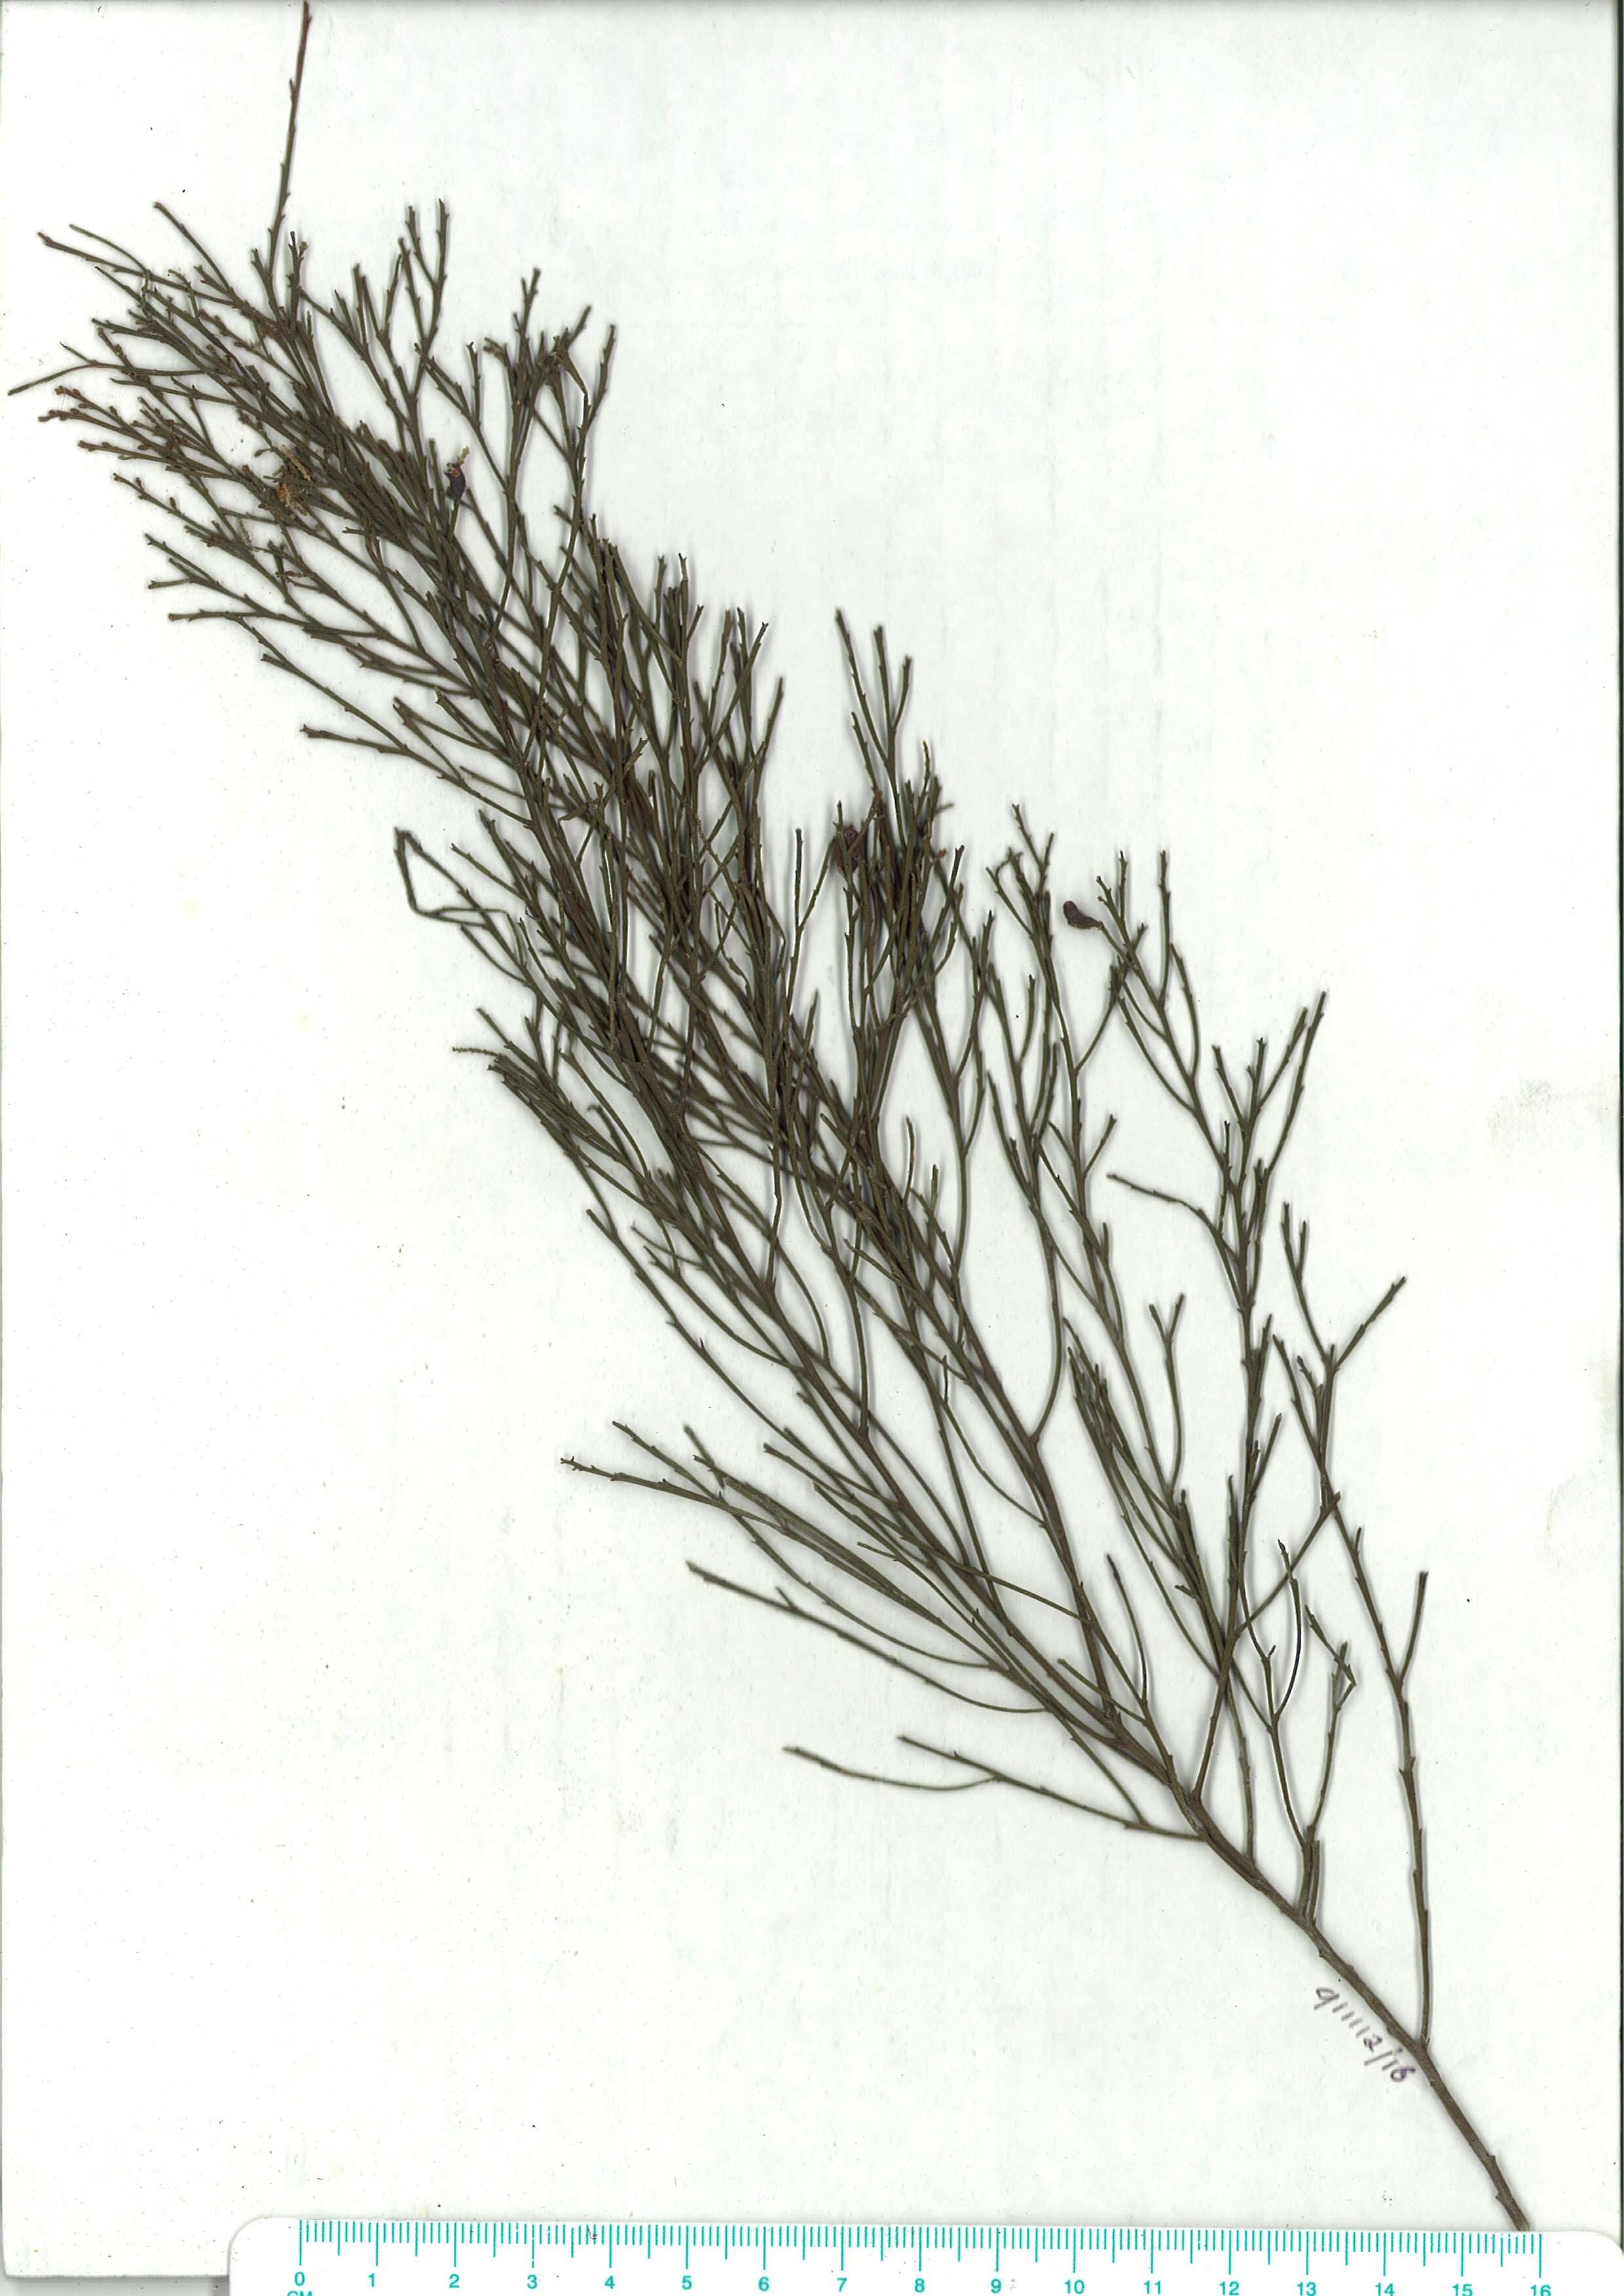 Scanned herbarium image Exocarpos cupressiformis